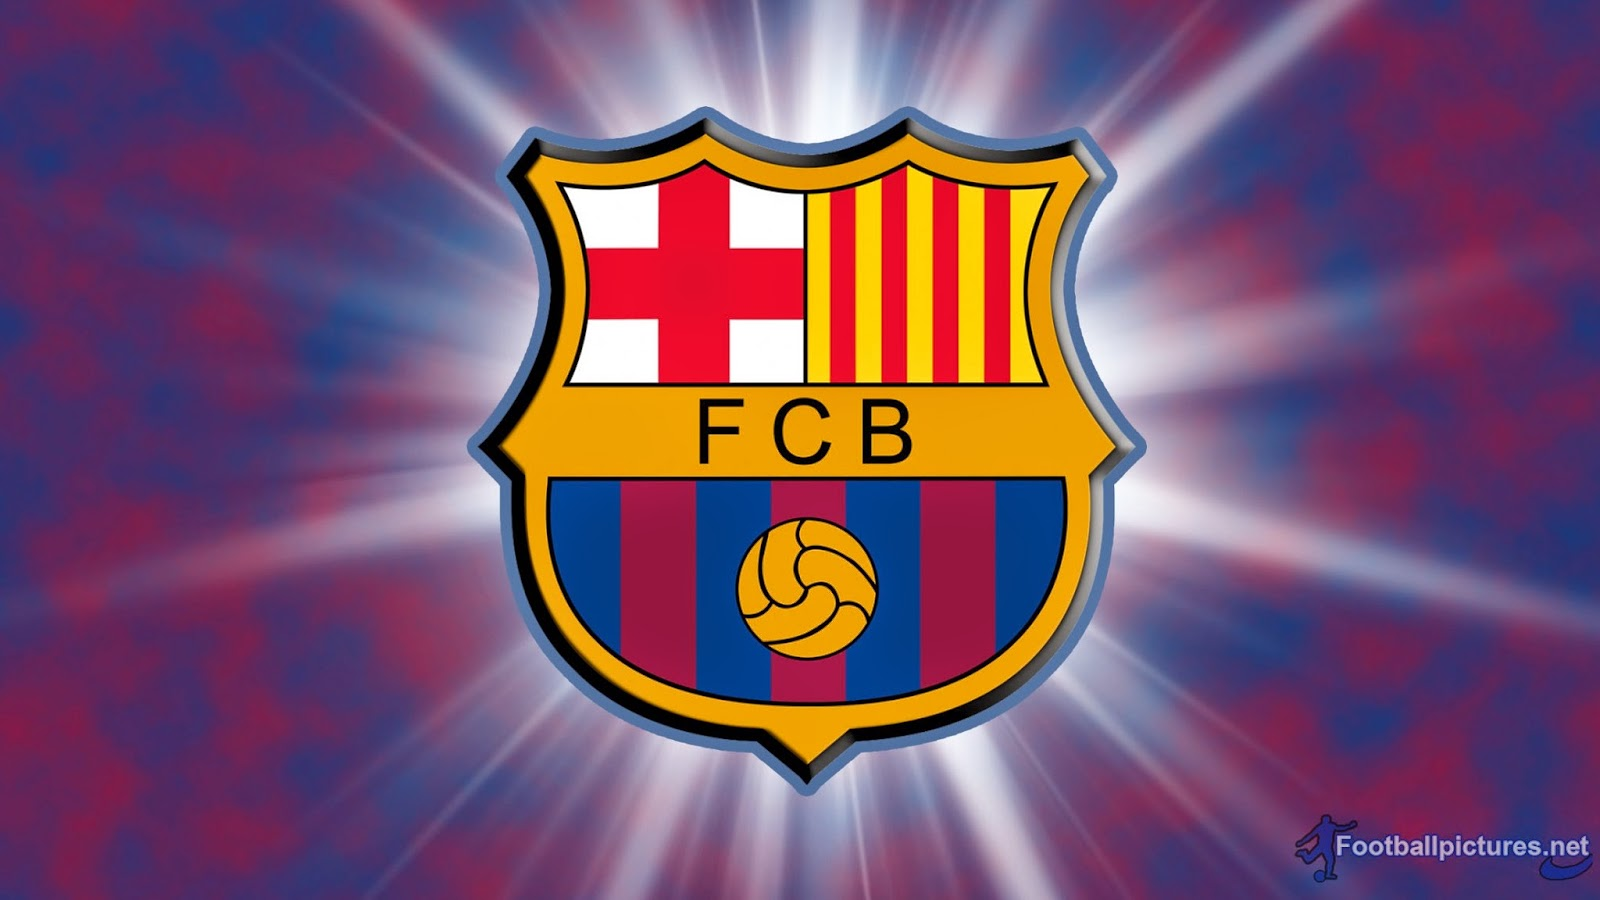 3d Image Live Wallpaper Android App Barcelona Football Club Wallpaper Football Wallpaper Hd